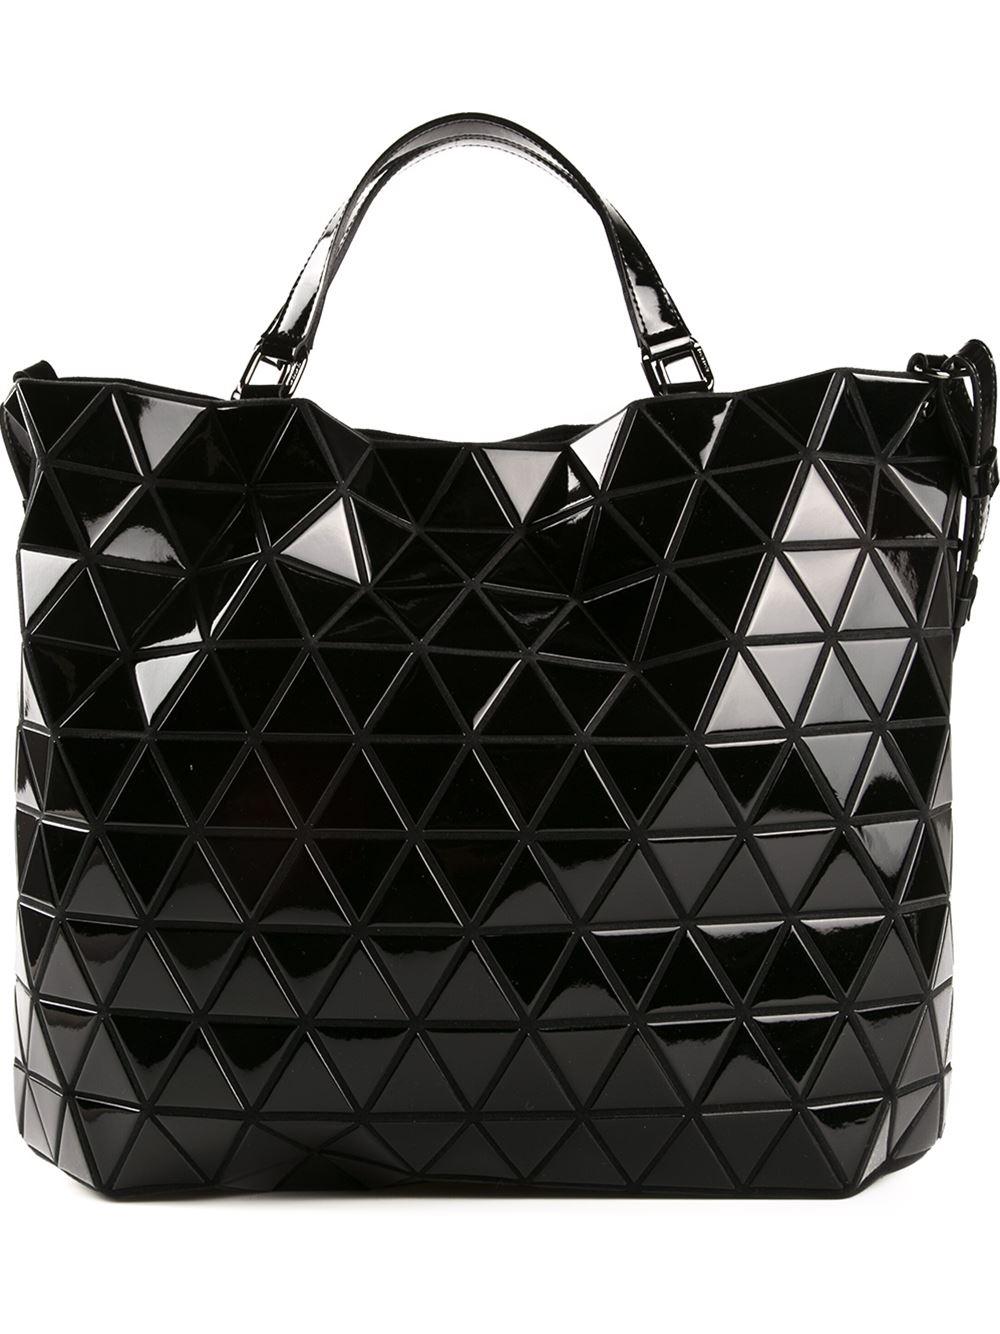 Bao Bao Issey Miyake Geometric Cross Body Bag In Black Lyst